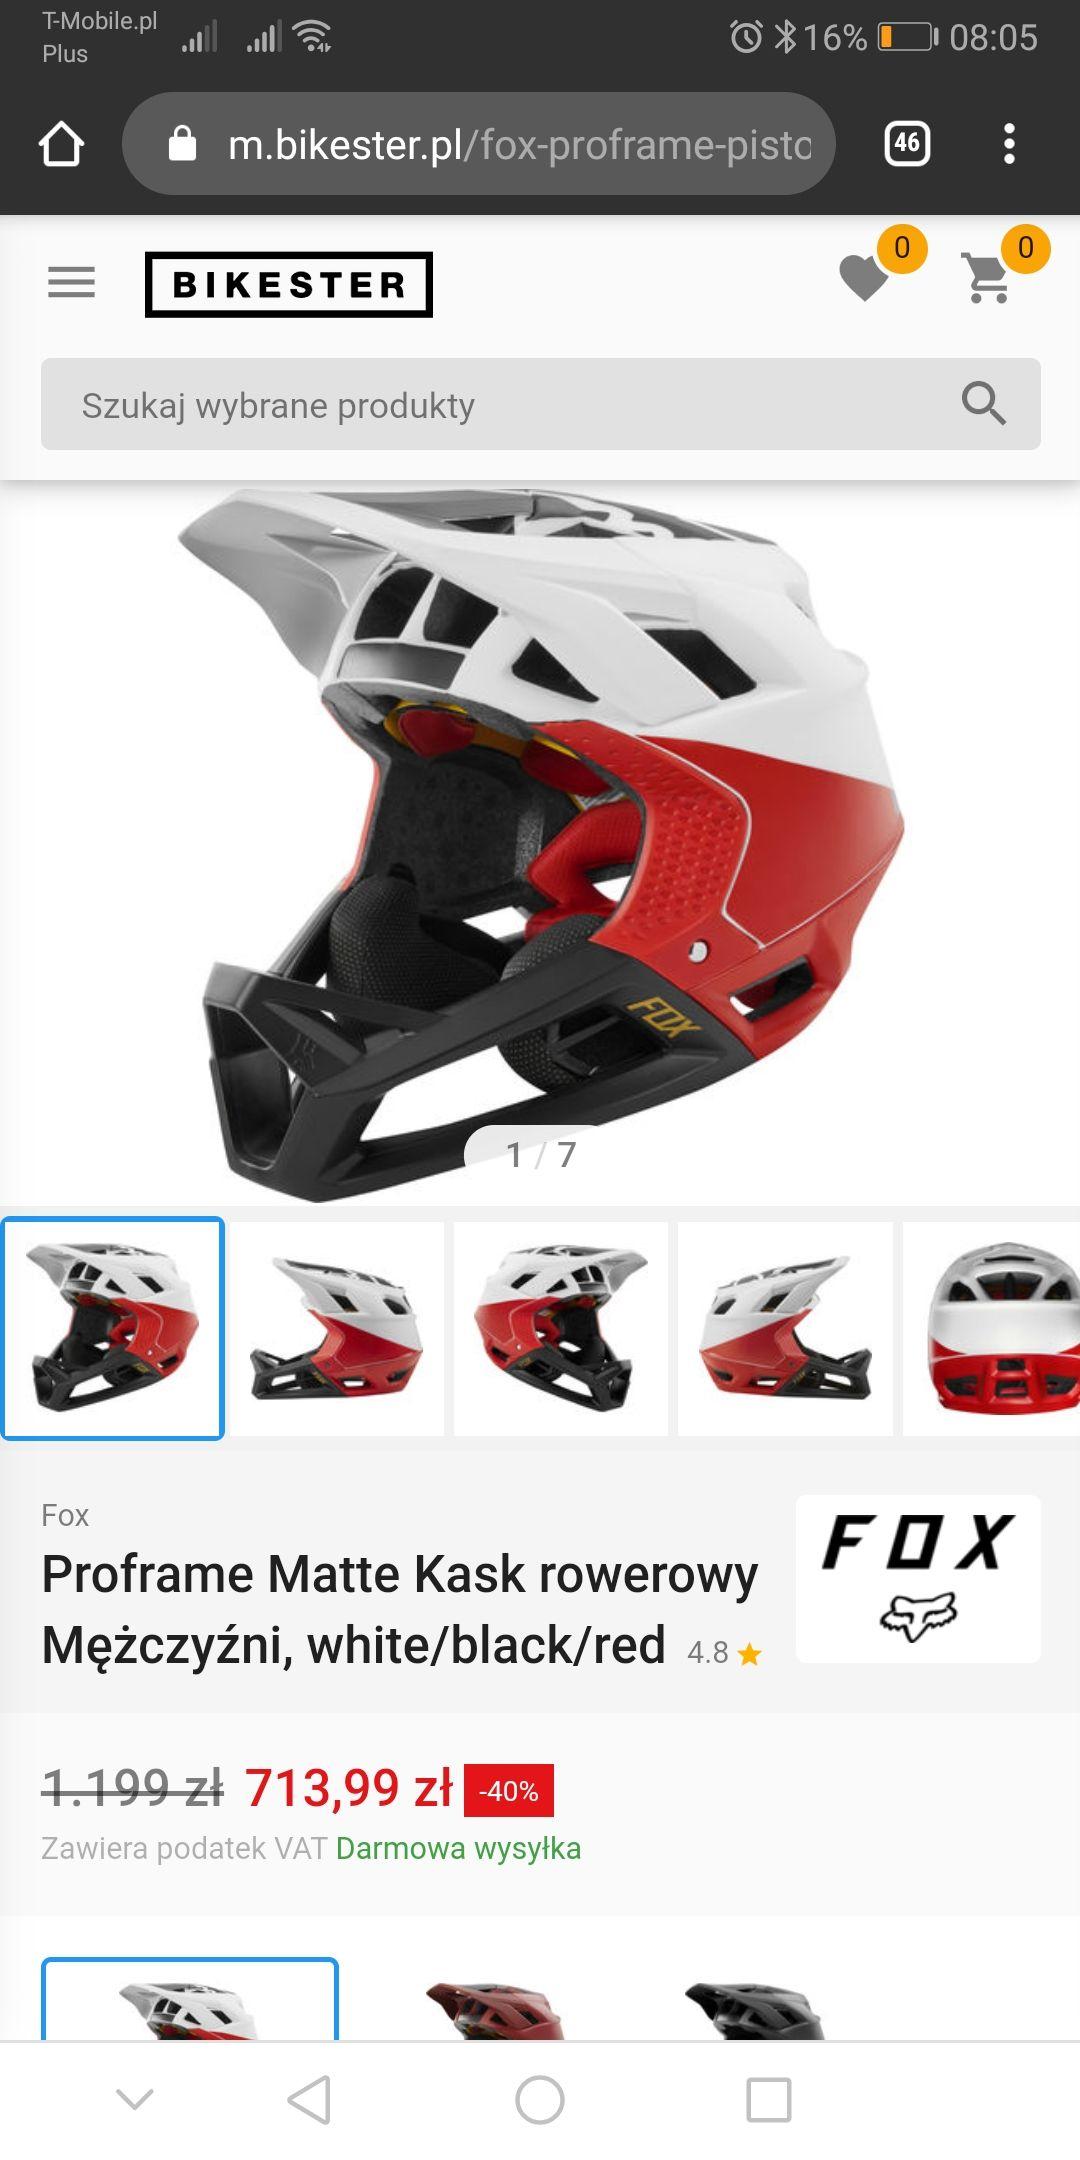 Fox Proframe kask enduro/fr/dh